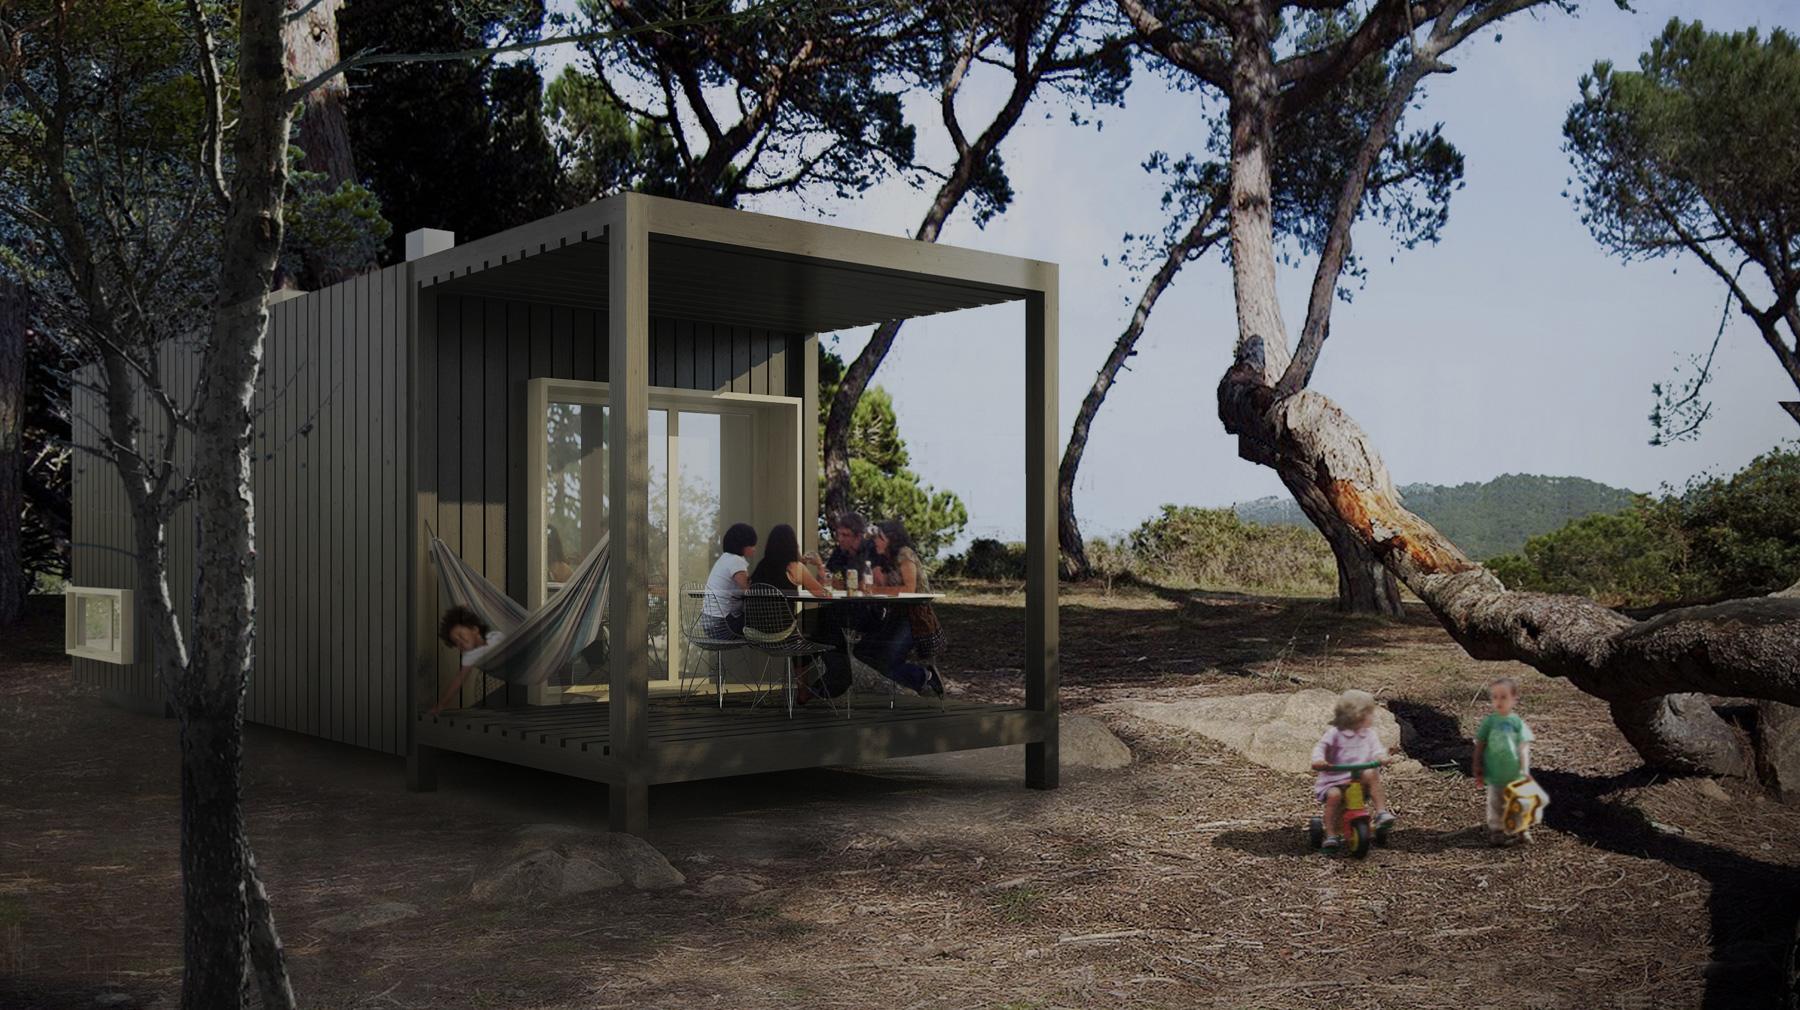 ... Cases prefabricades de fusta, sostenibles, transportables i modulars